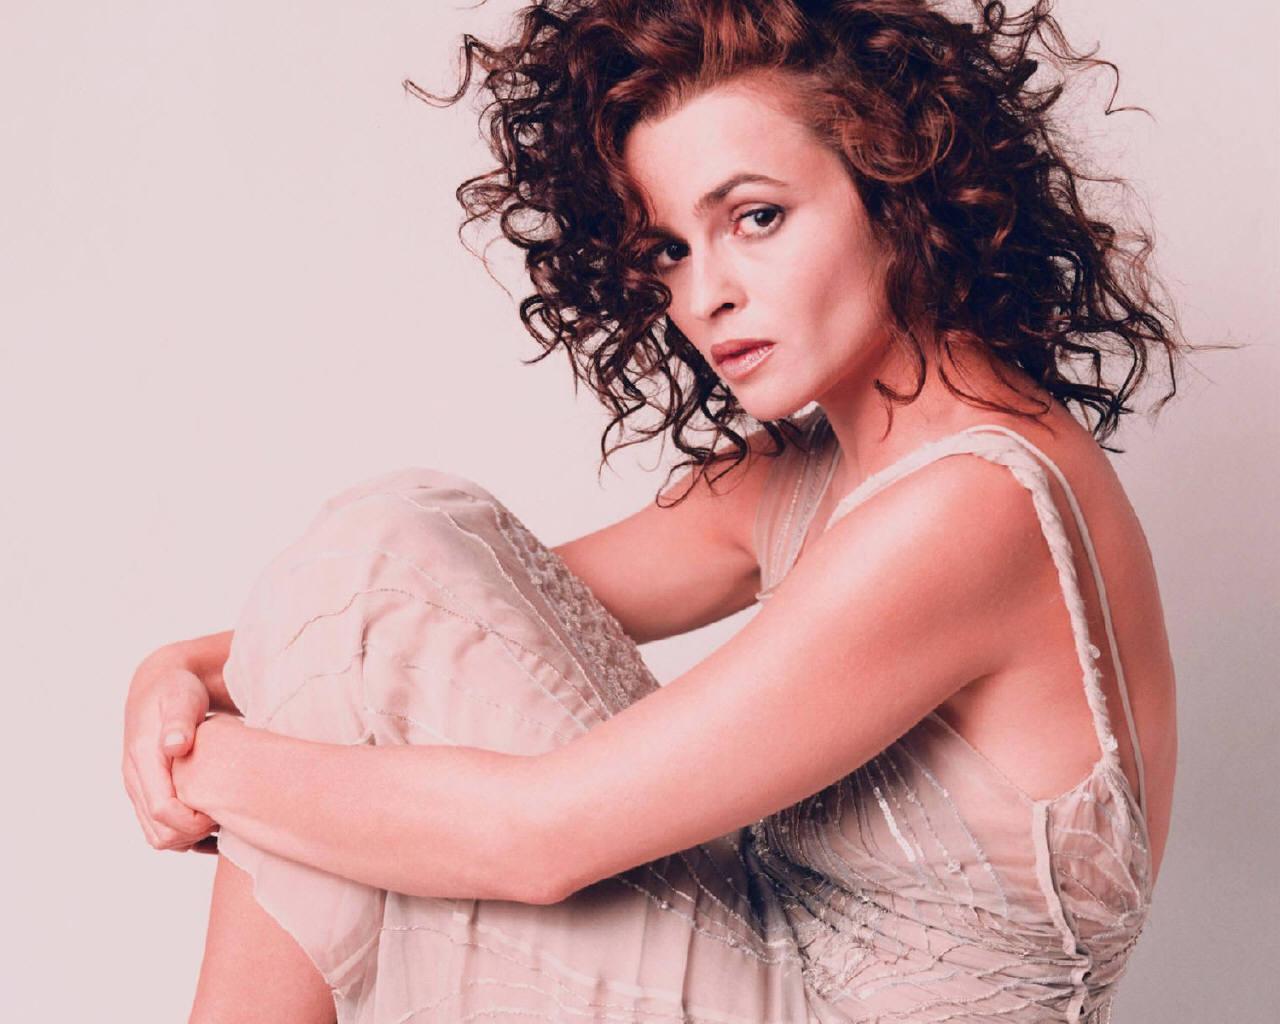 Helena Bonham Carter - Helena Bonham Carter Wallpaper (129334 ... Helena Bonham Carter